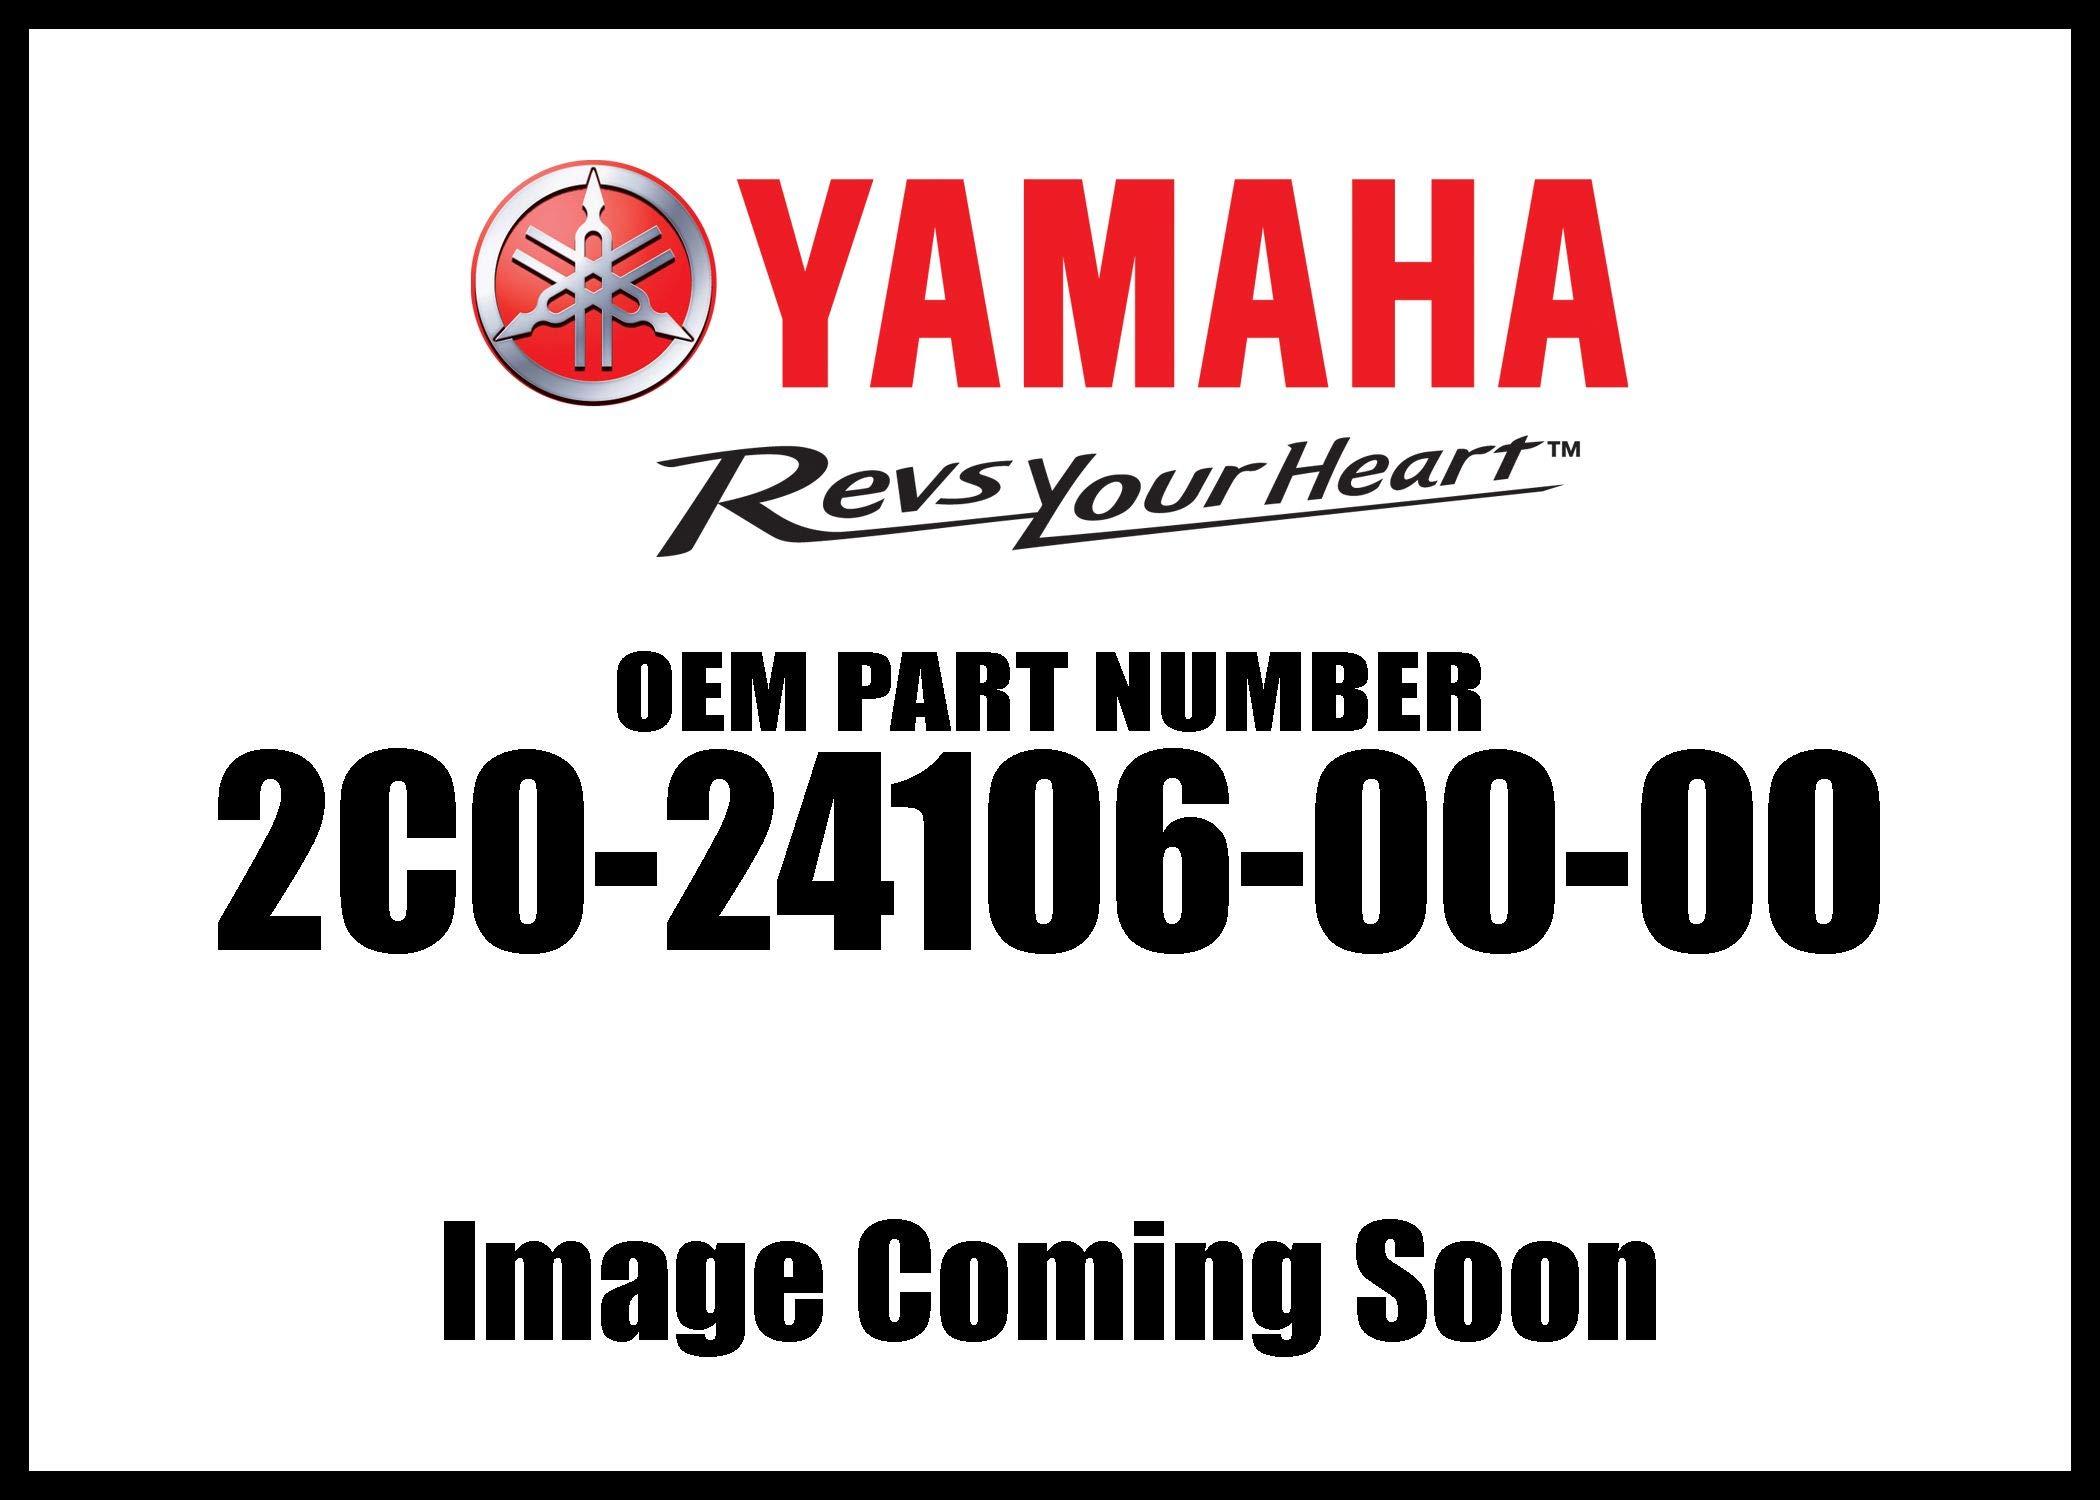 Yamaha 2C0241060000 Tank Side Cover Assembly